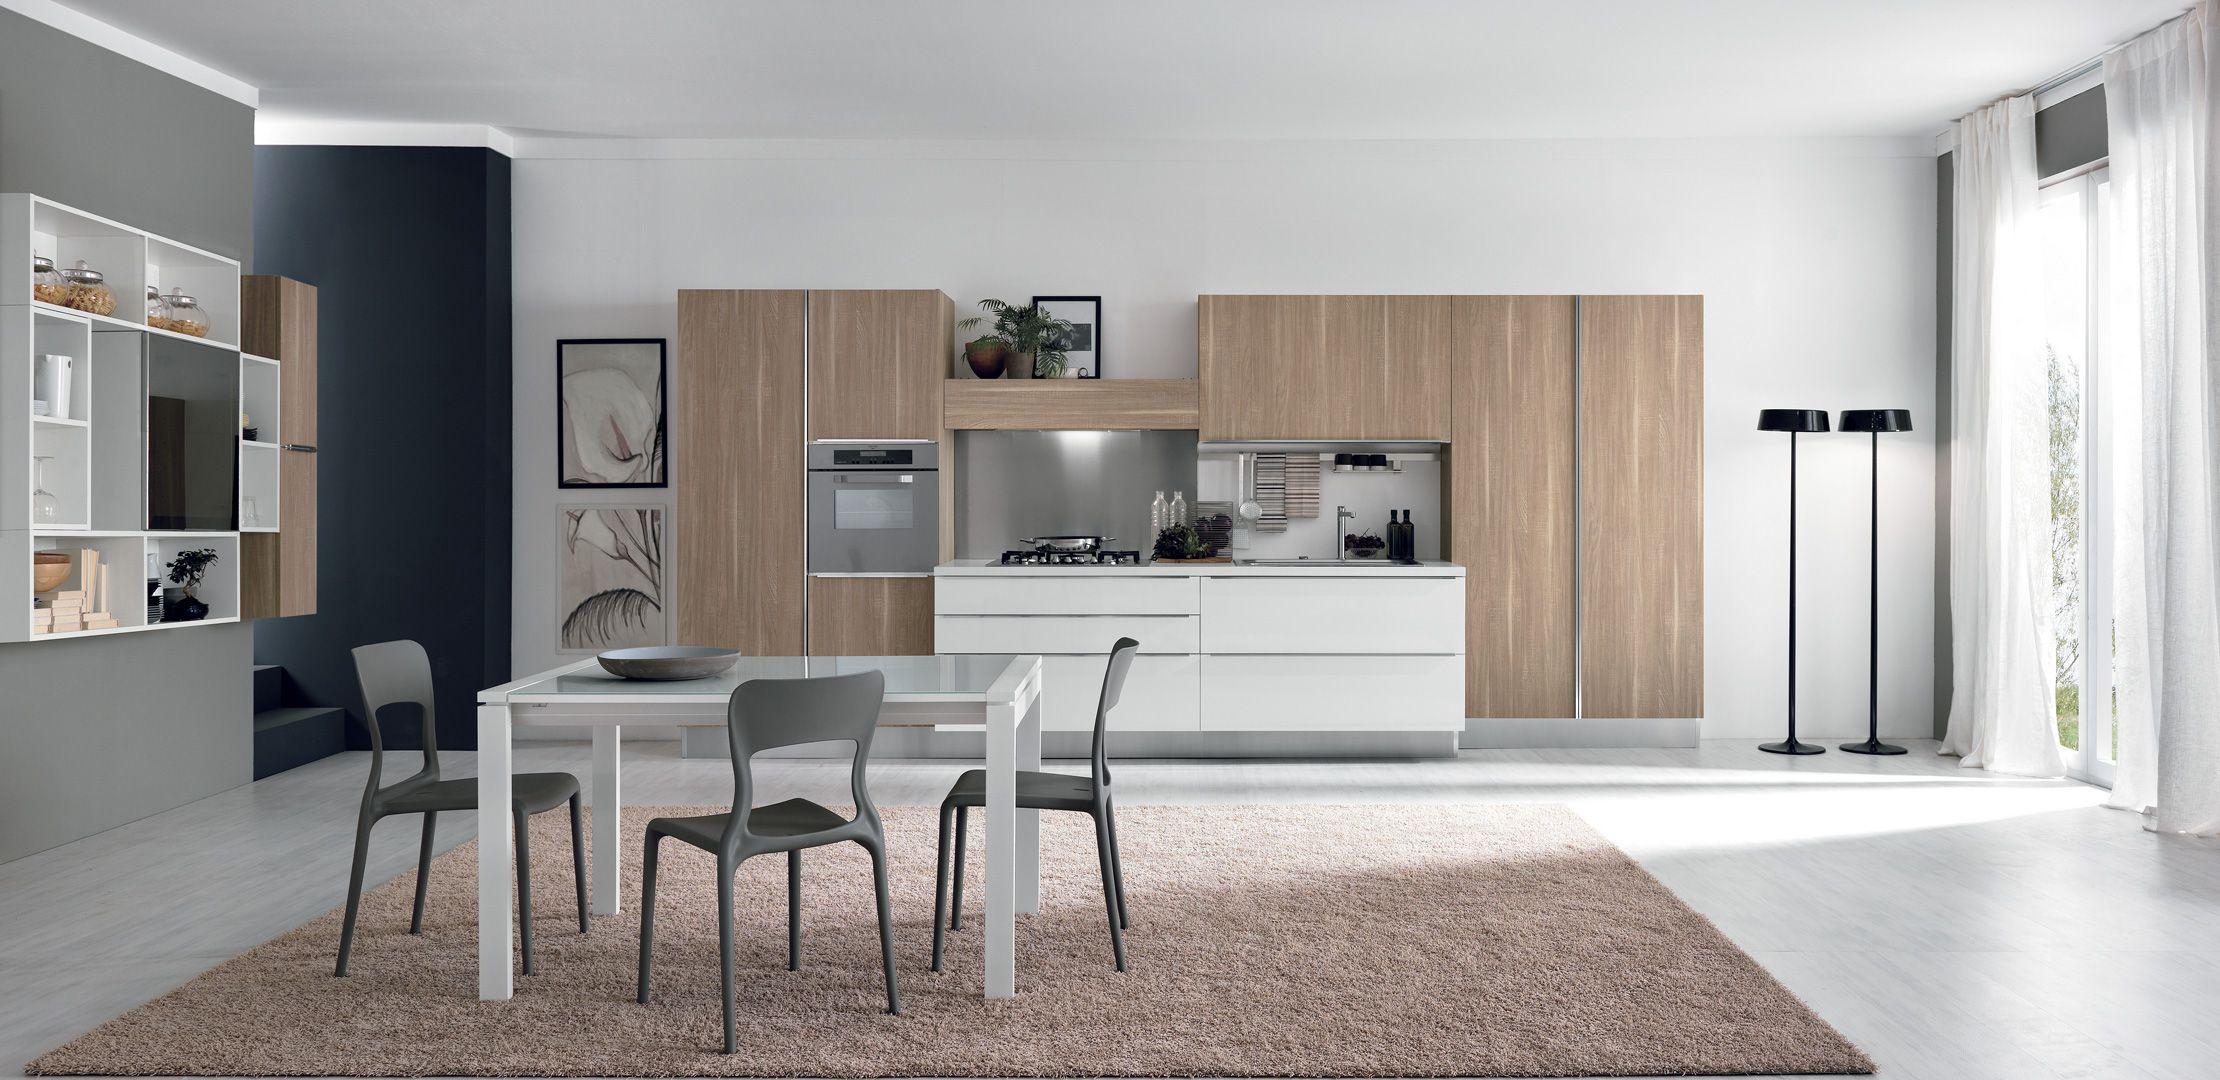 The Terra Collection Aran Italian Kitchens Italian Kitchen Cabinets Italian Kitchen Kitchen